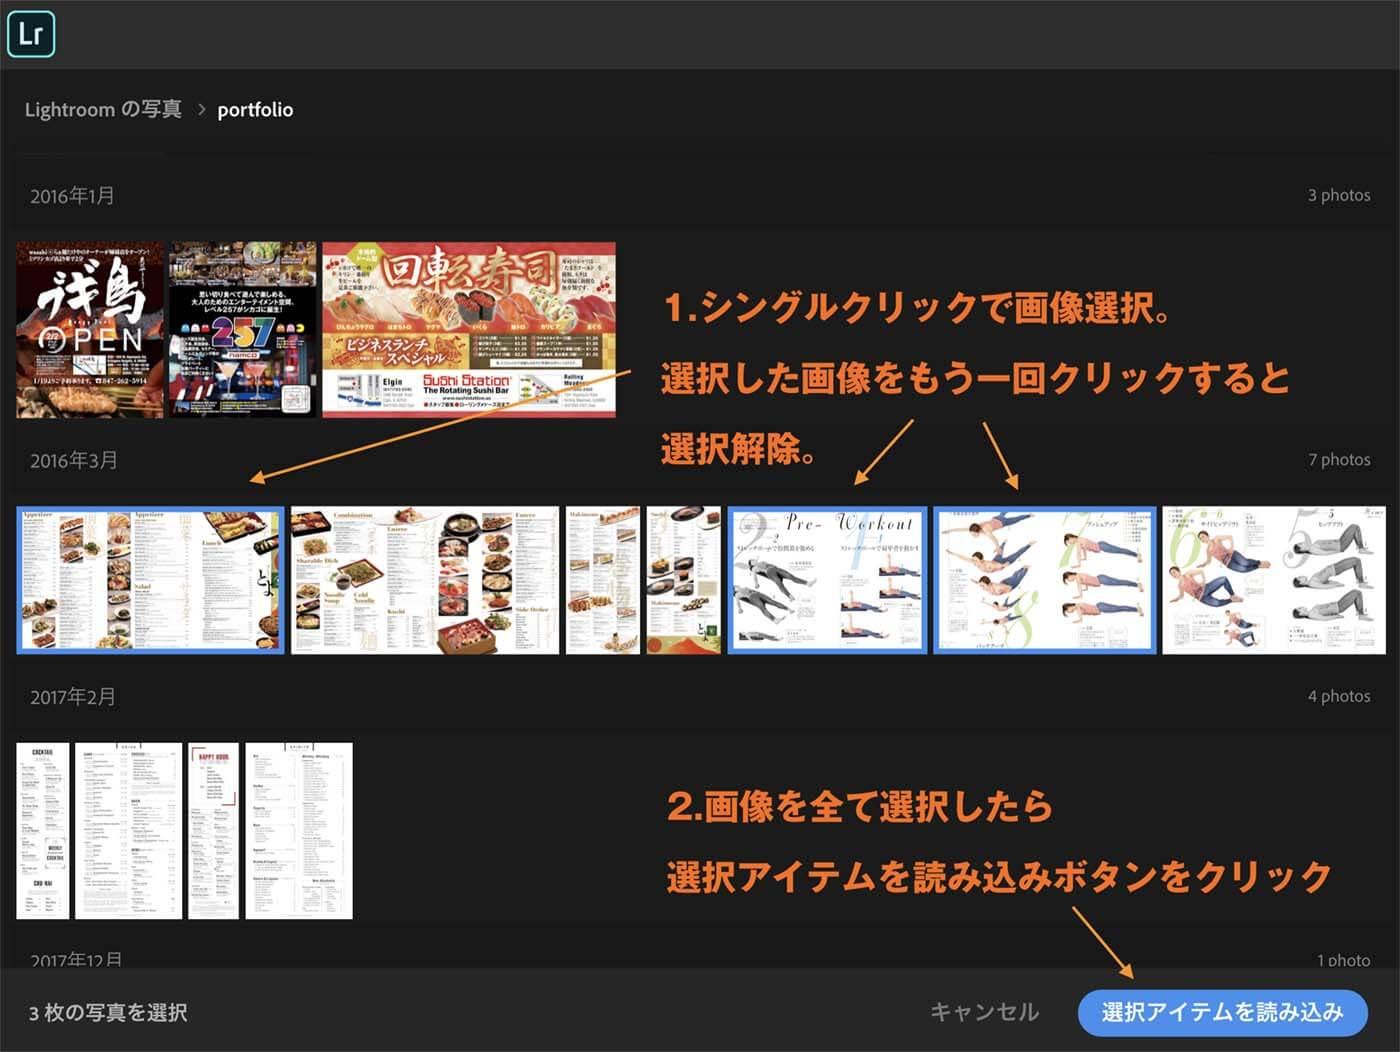 lightroomの写真をadobe portfolioに追加する手順